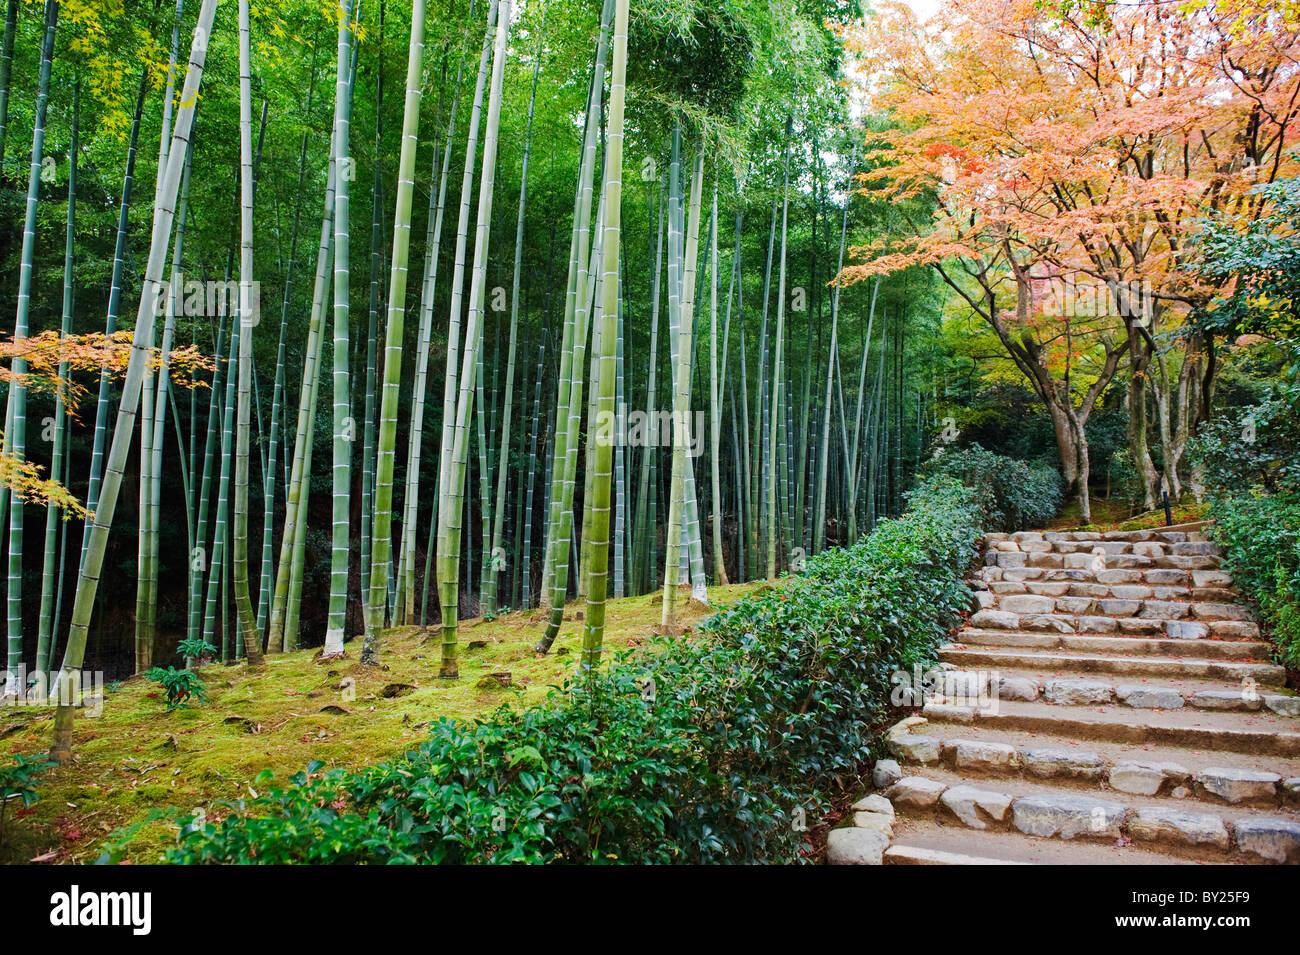 Asia. Japan. Kyoto. Sagano. Arashiyama. Jojakko ji (Jojakkoji) Temple Stock Photo. Royalty Free Image: 33854333 - Alamy